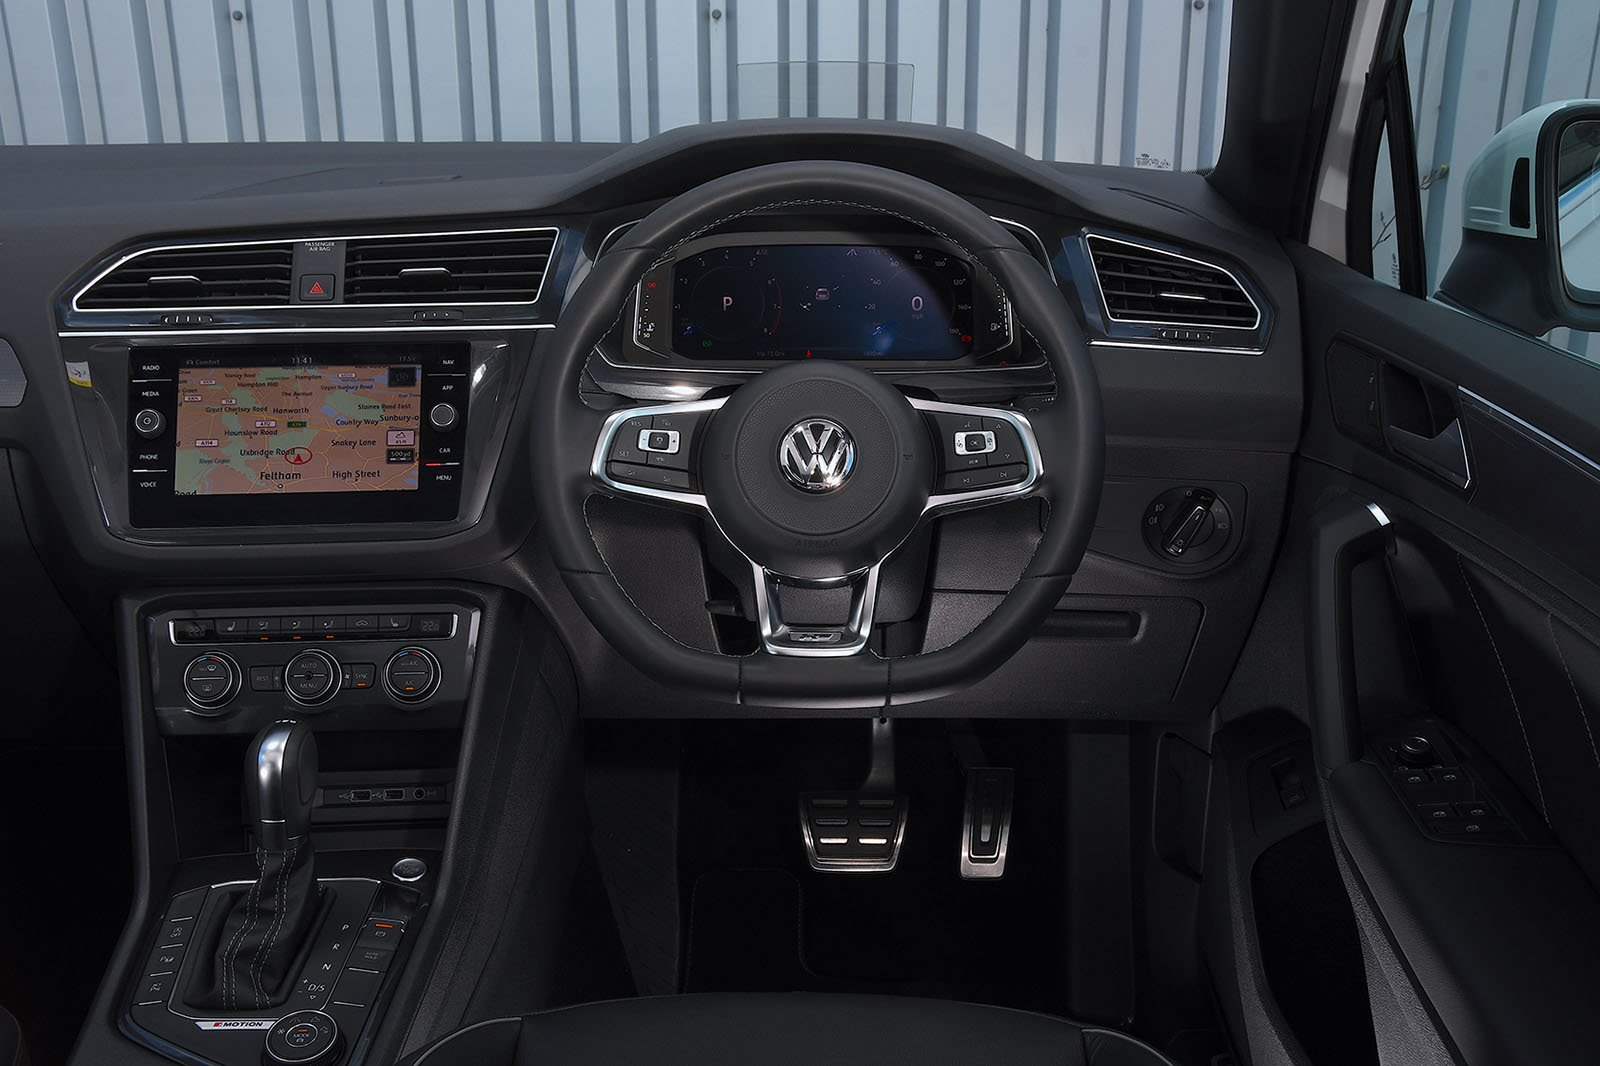 2019 Volkswagen Tiguan 2.0 TSI 230 interior